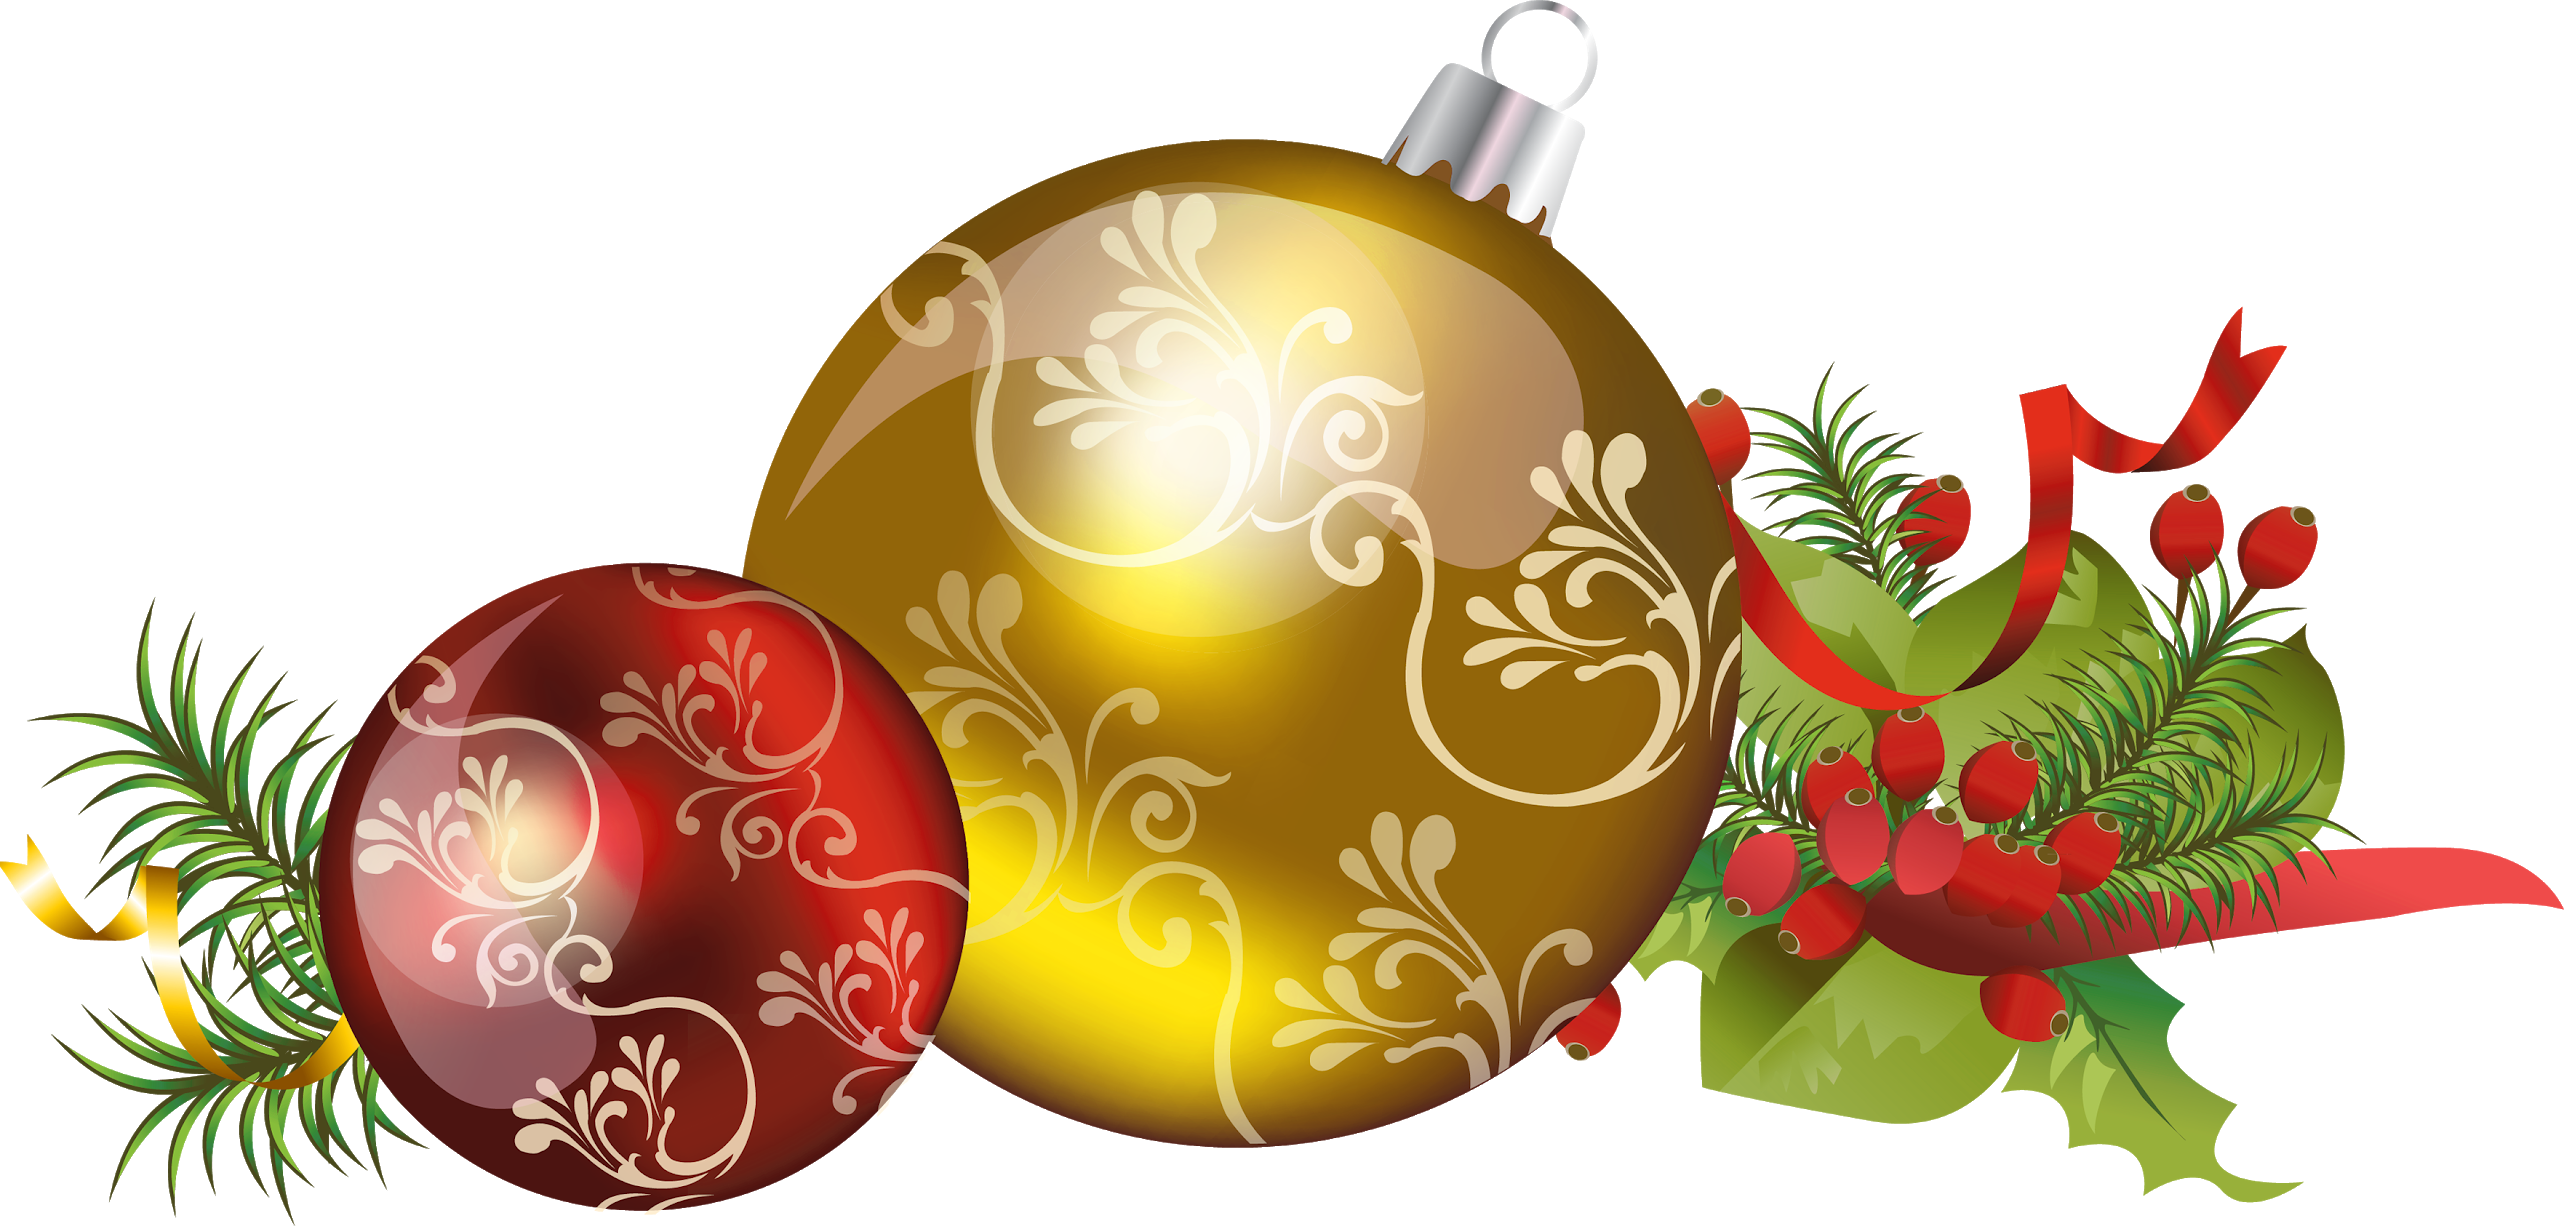 2015 Clip Art Christmas